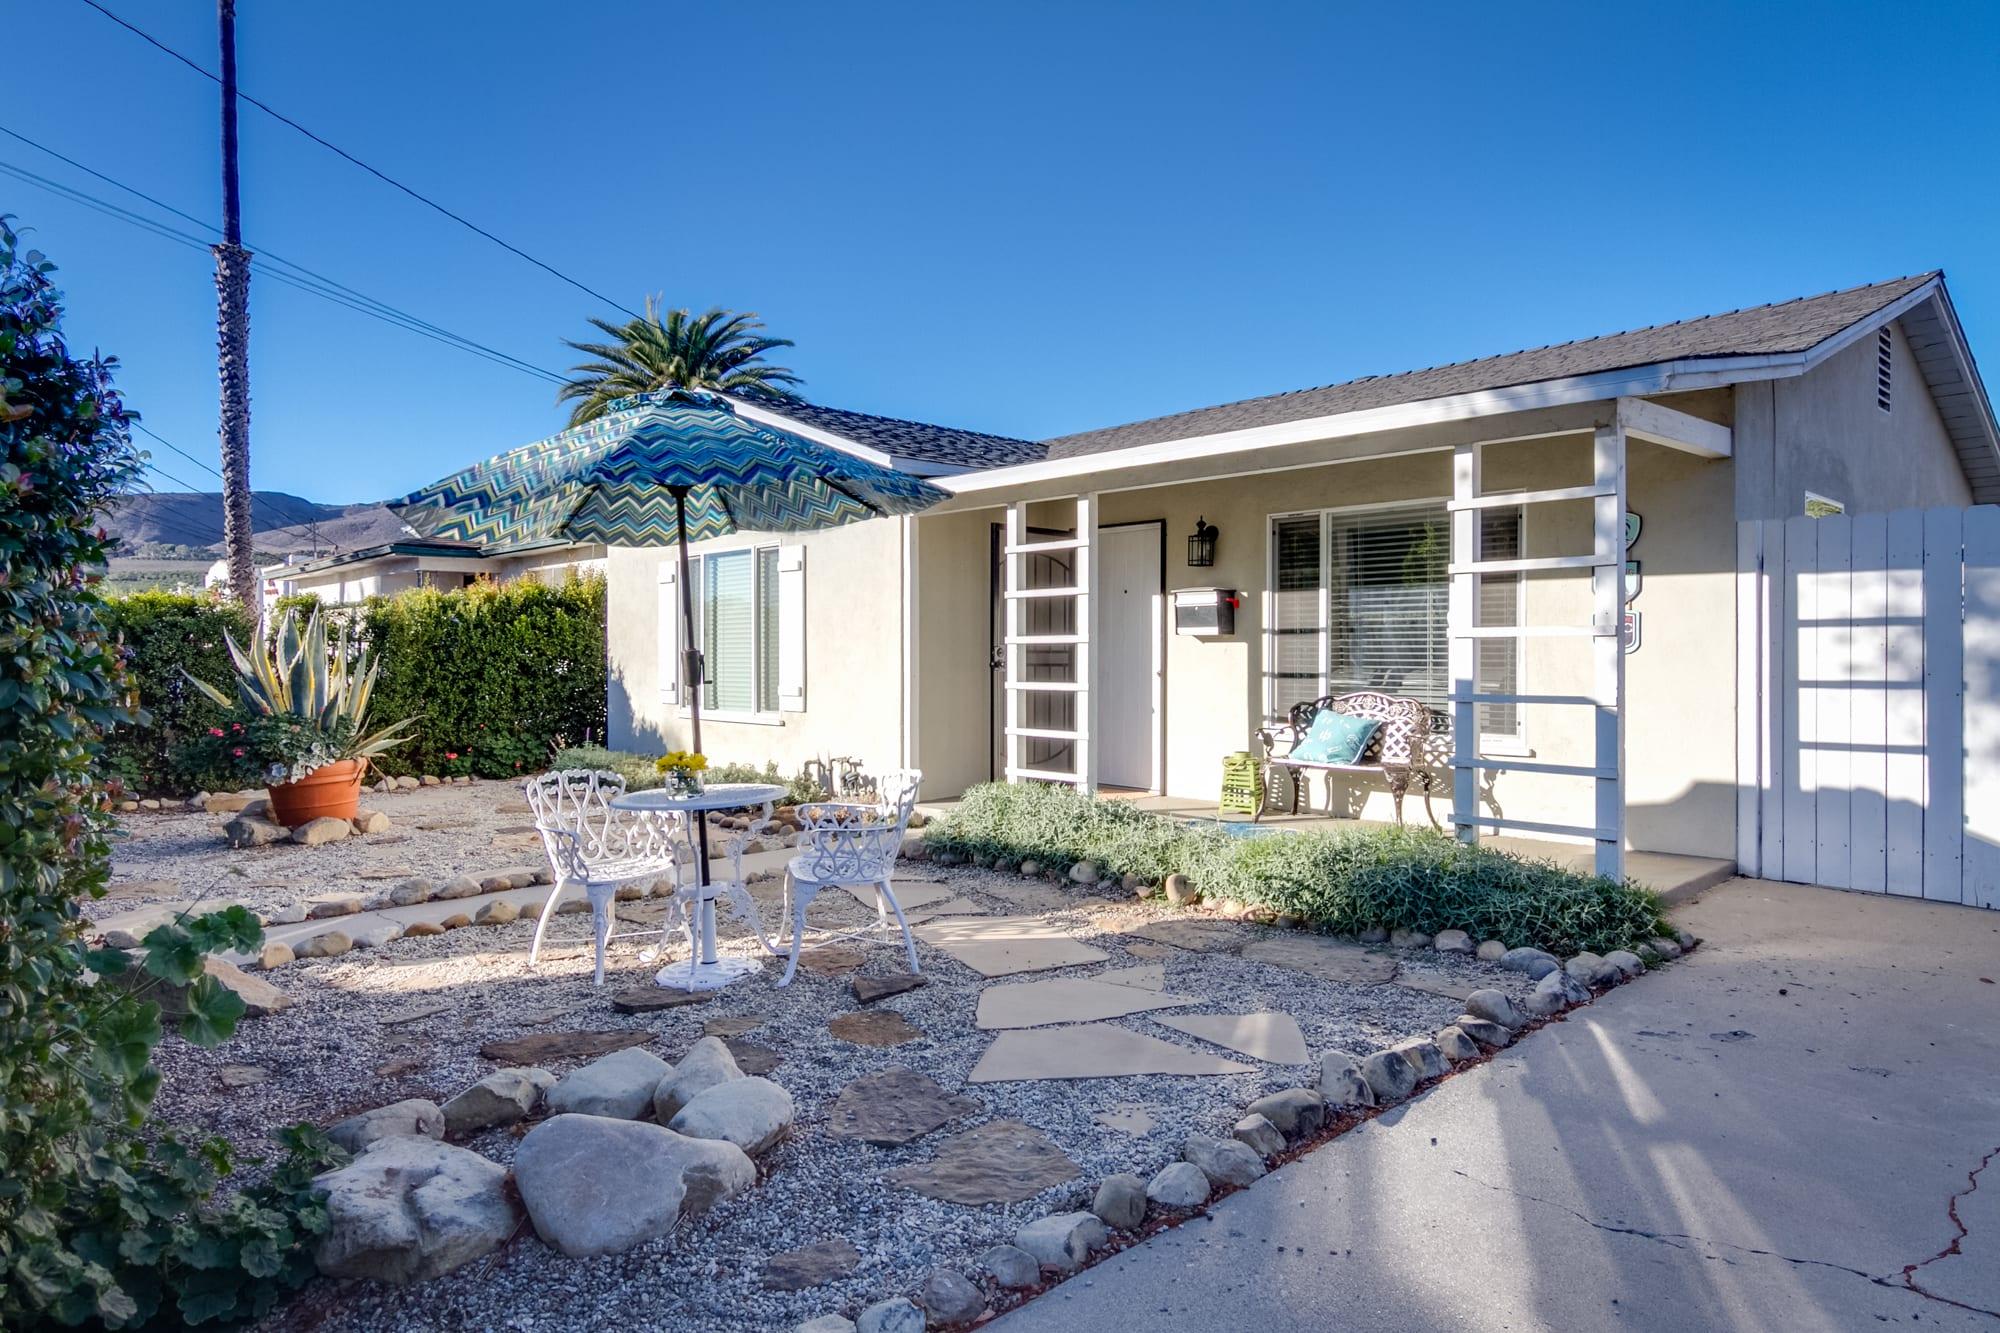 Ventura Vacation Rental | Single Story Home | 2BR | 1BA | 833 Sq Ft